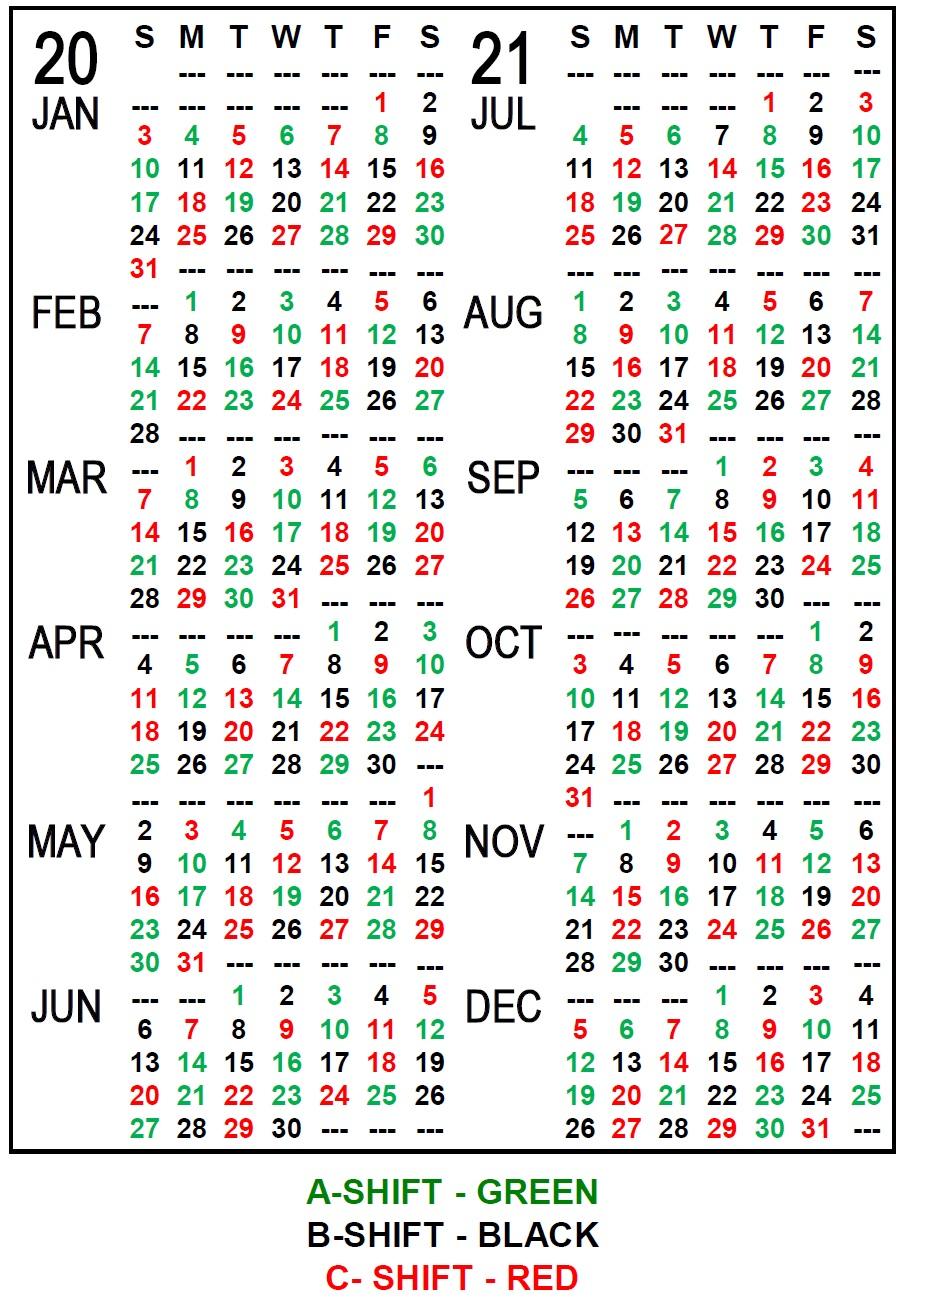 Iaff Local 21 - in Fire Shift Calendar